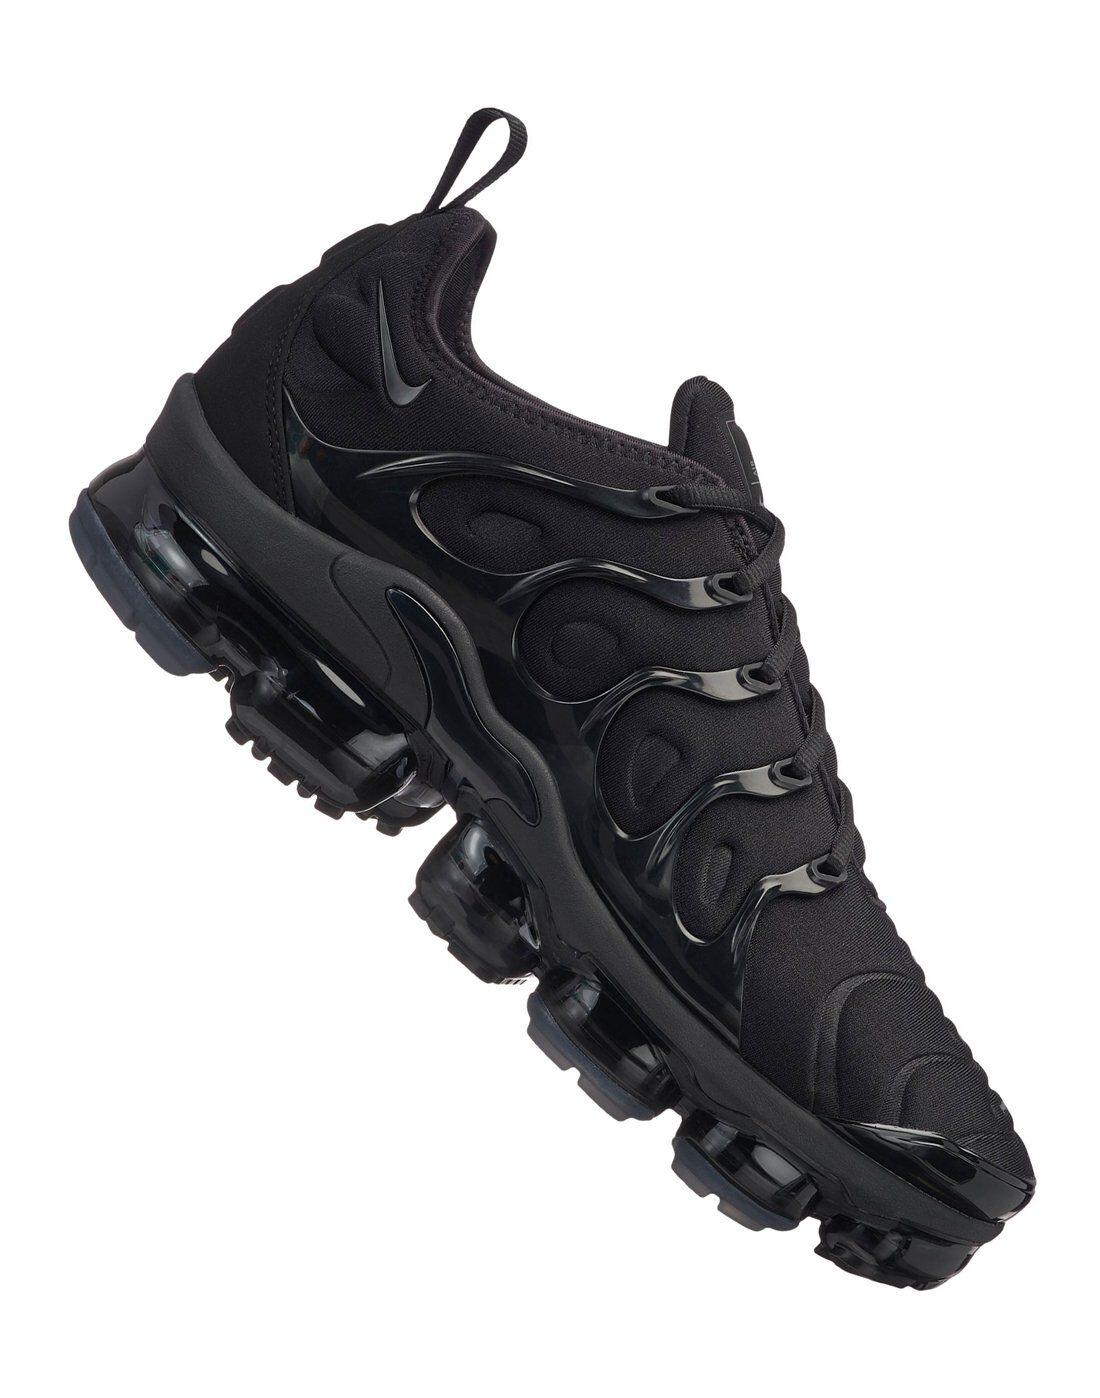 Nike Air Vapormax Plus Triple Black